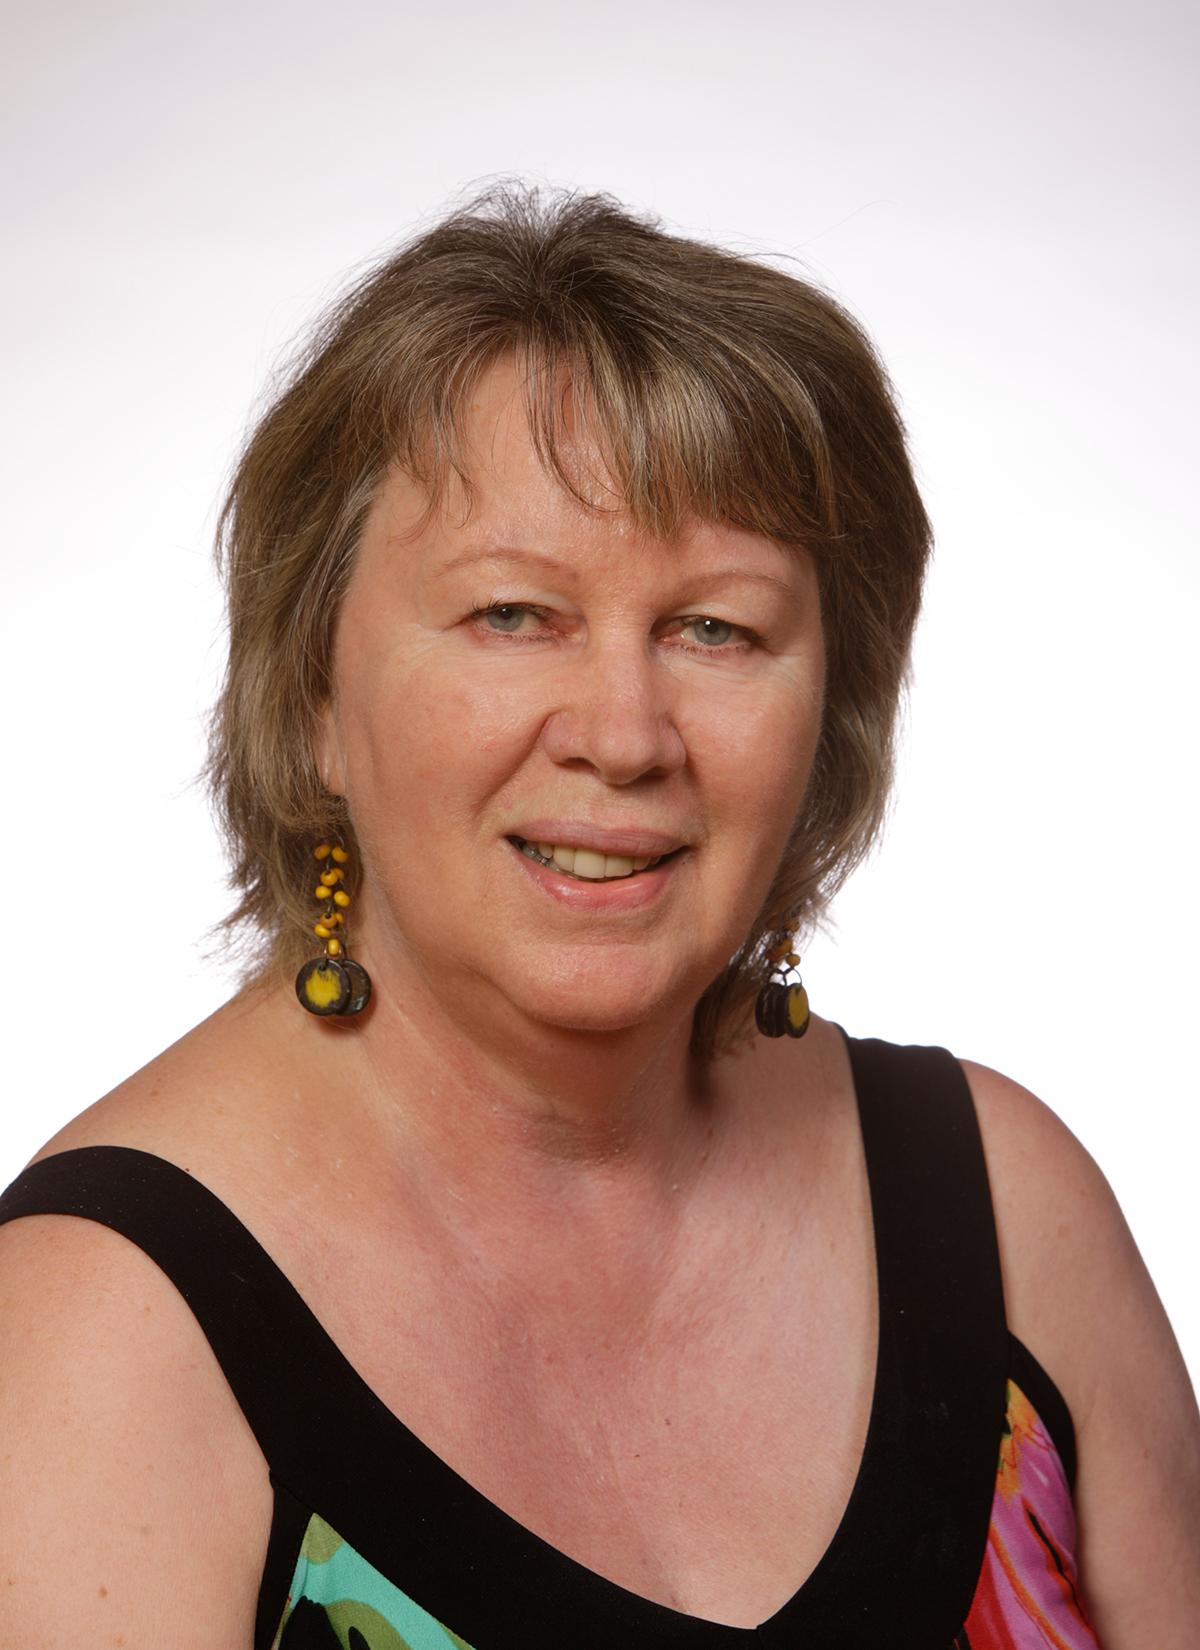 Mme Denise Girard